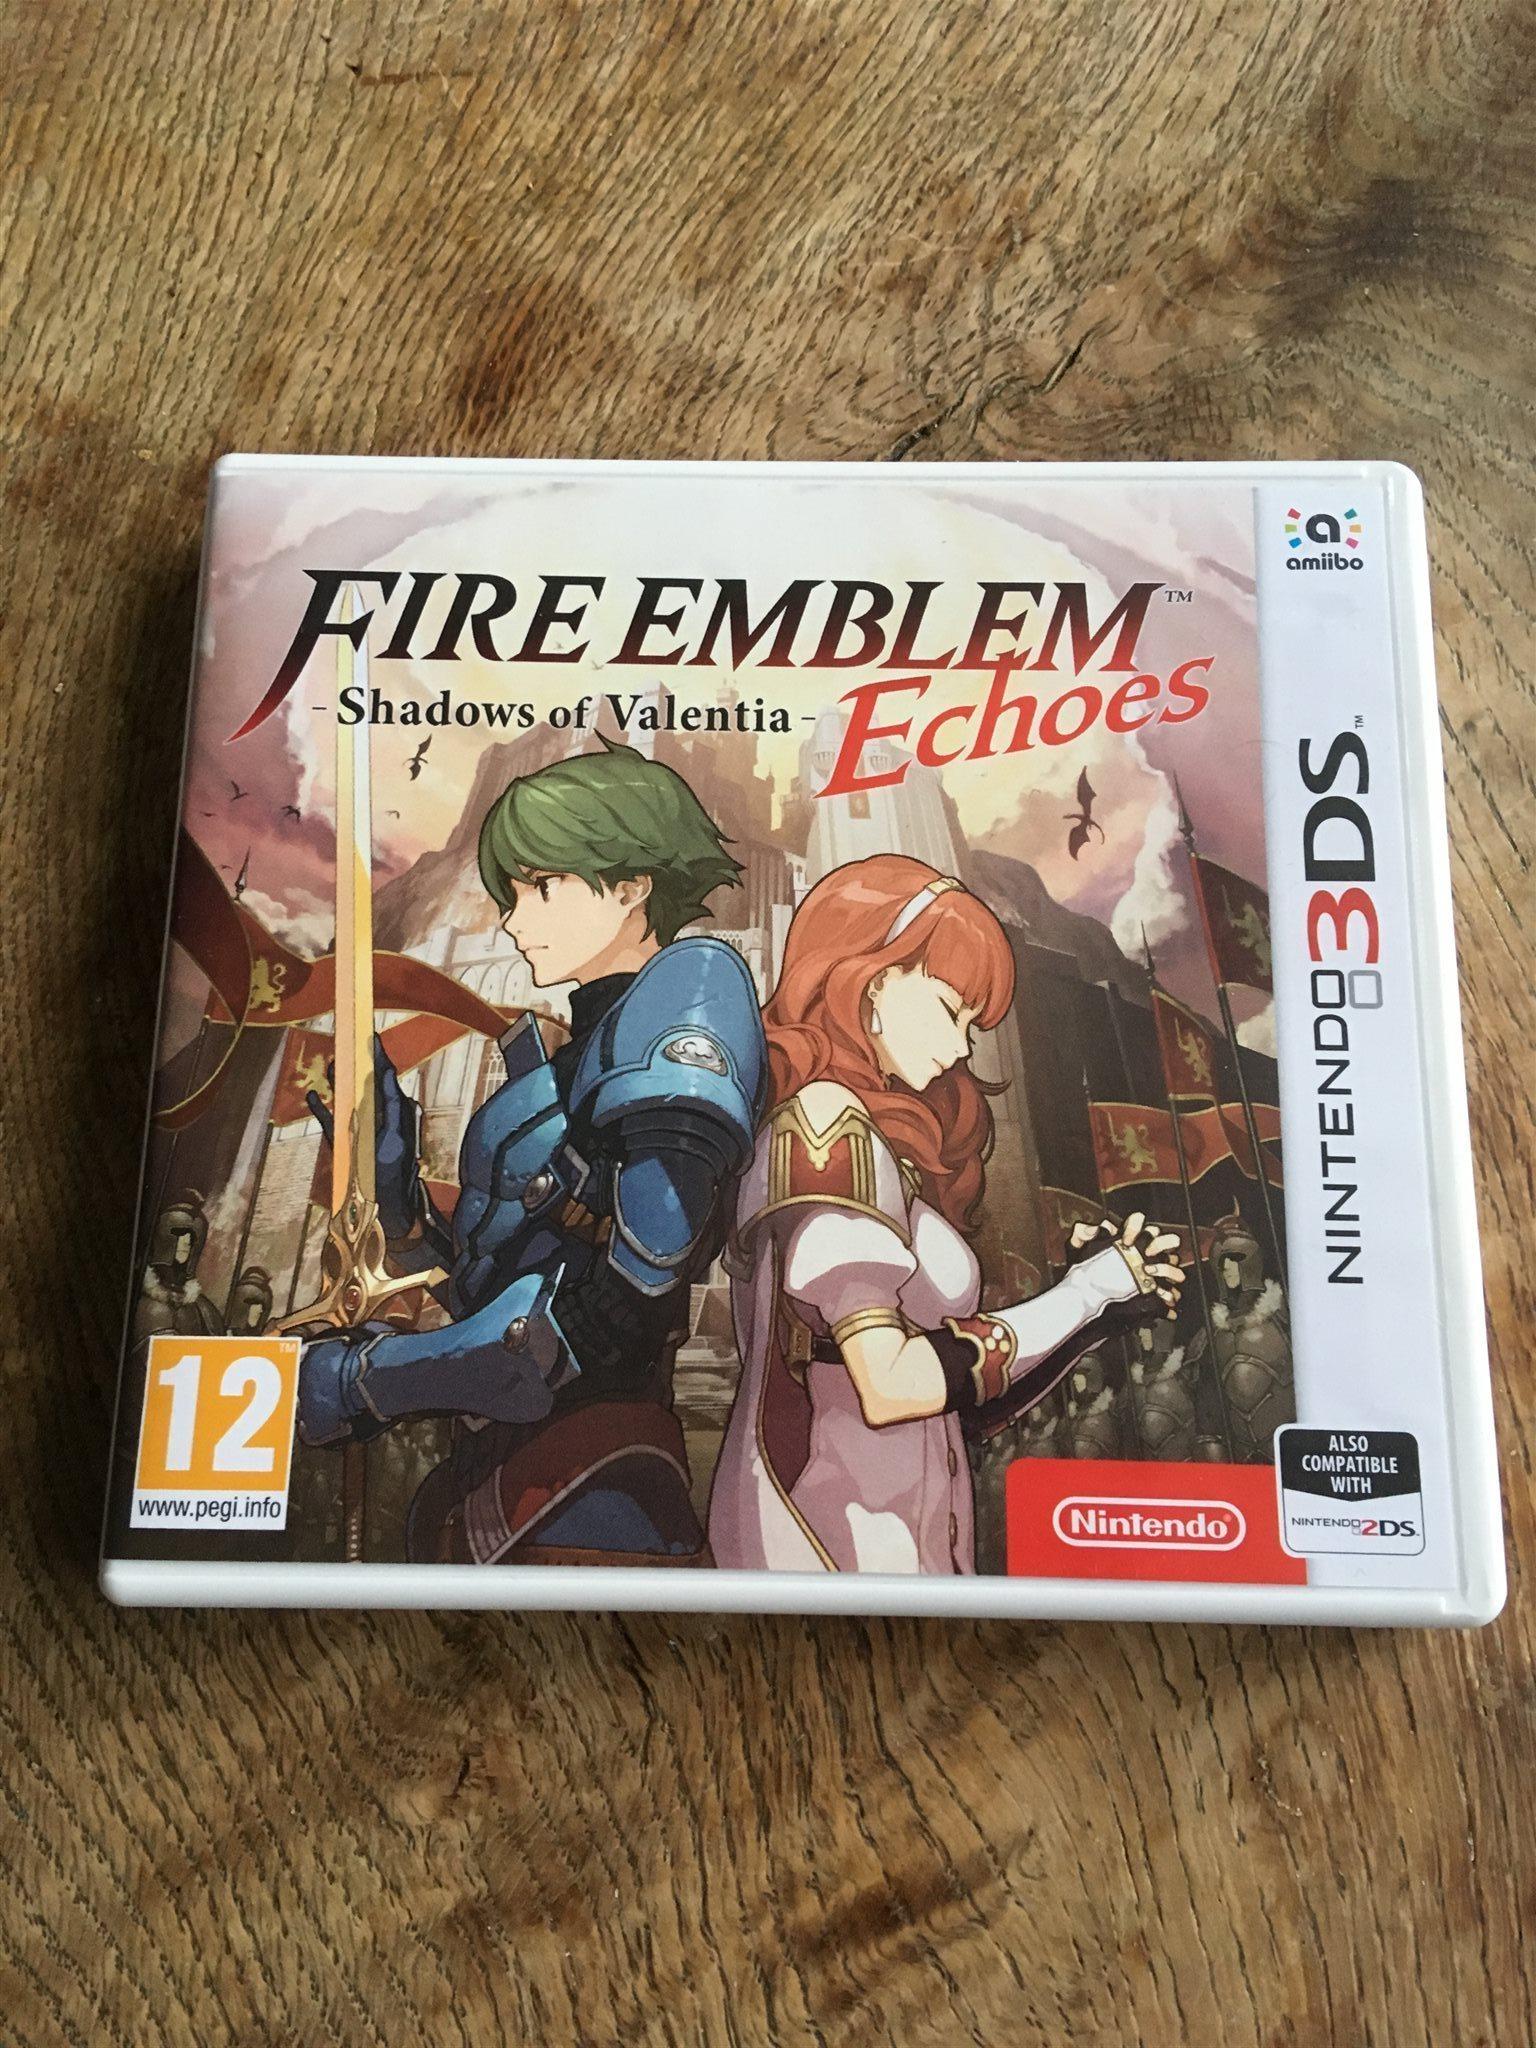 Fire Emblem Echoes Shadows Of Valentia Ninten 325063004 Kp 3dsfire Shadow Nintendo 3ds